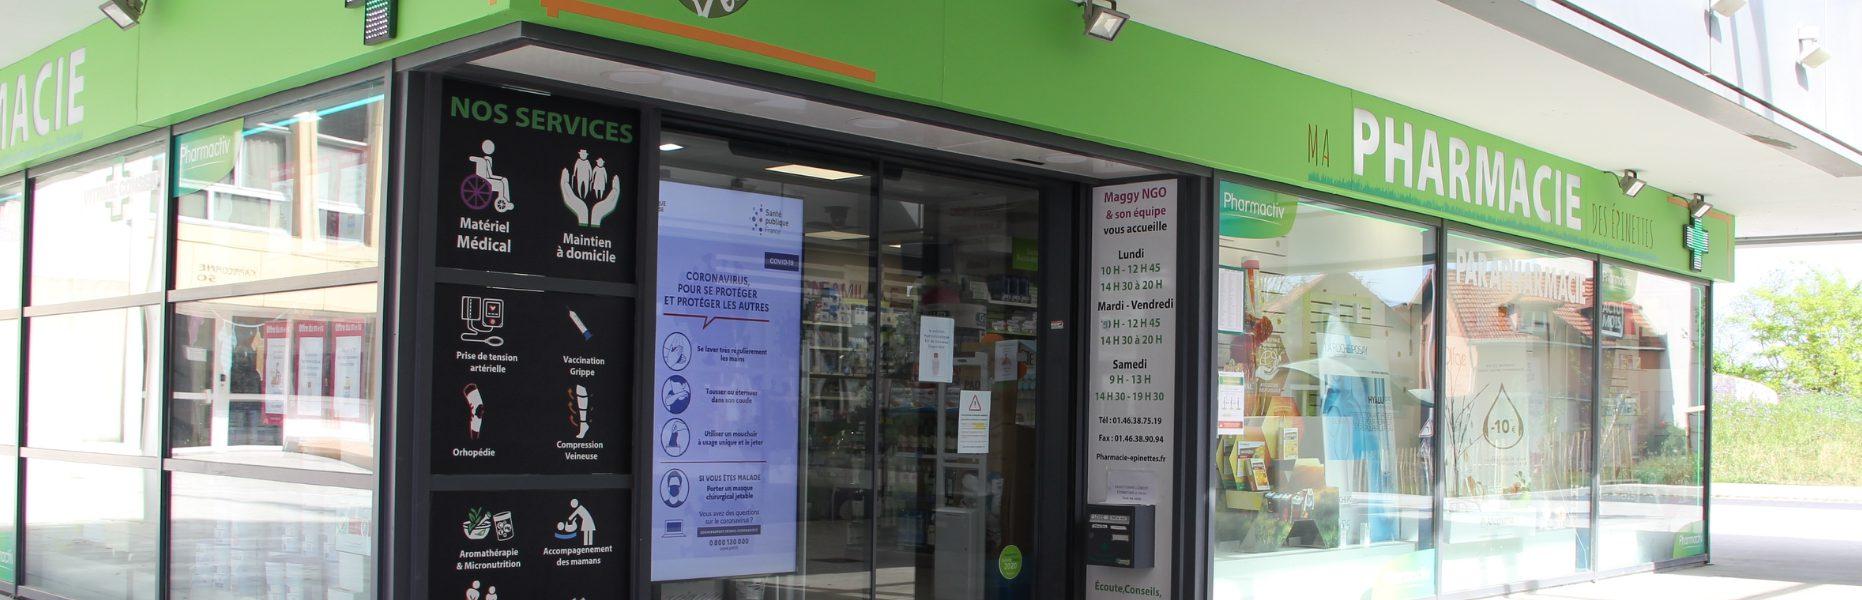 Pharmacie DES EPINETTES - Image Homepage 6